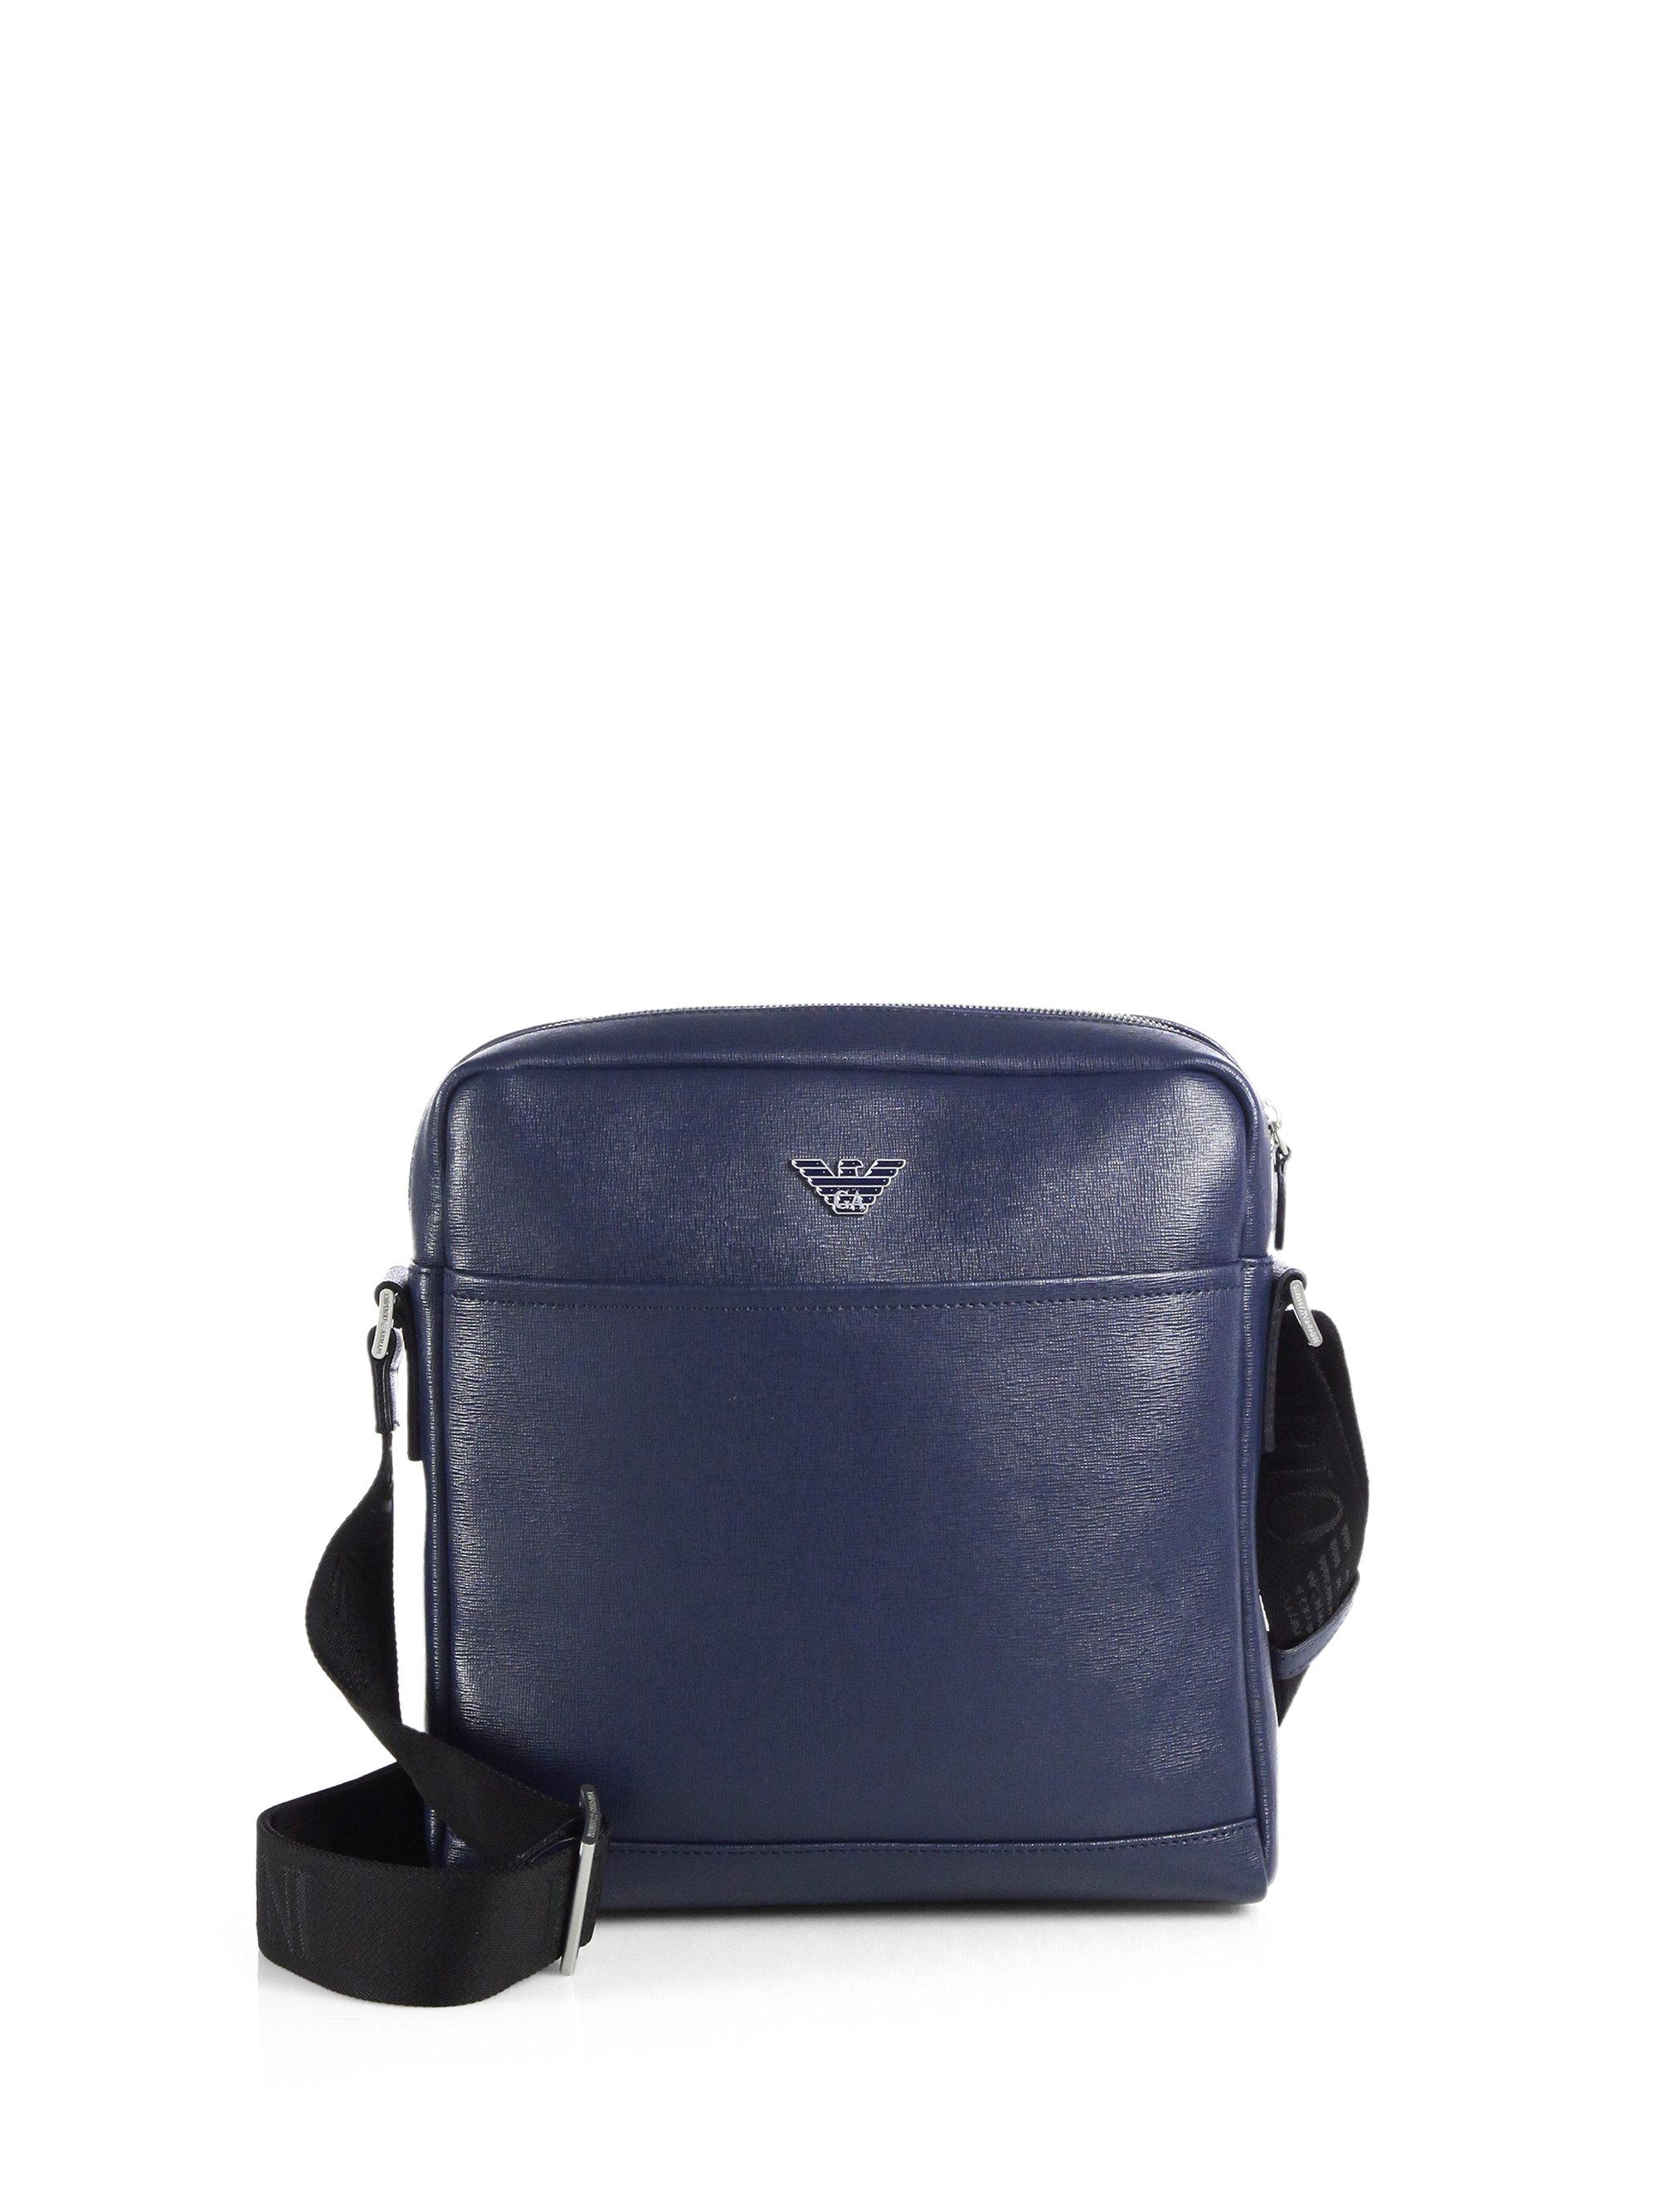 4554dbbcd6 Emporio Armani Leather Crossbody Bag in Blue for Men - Lyst